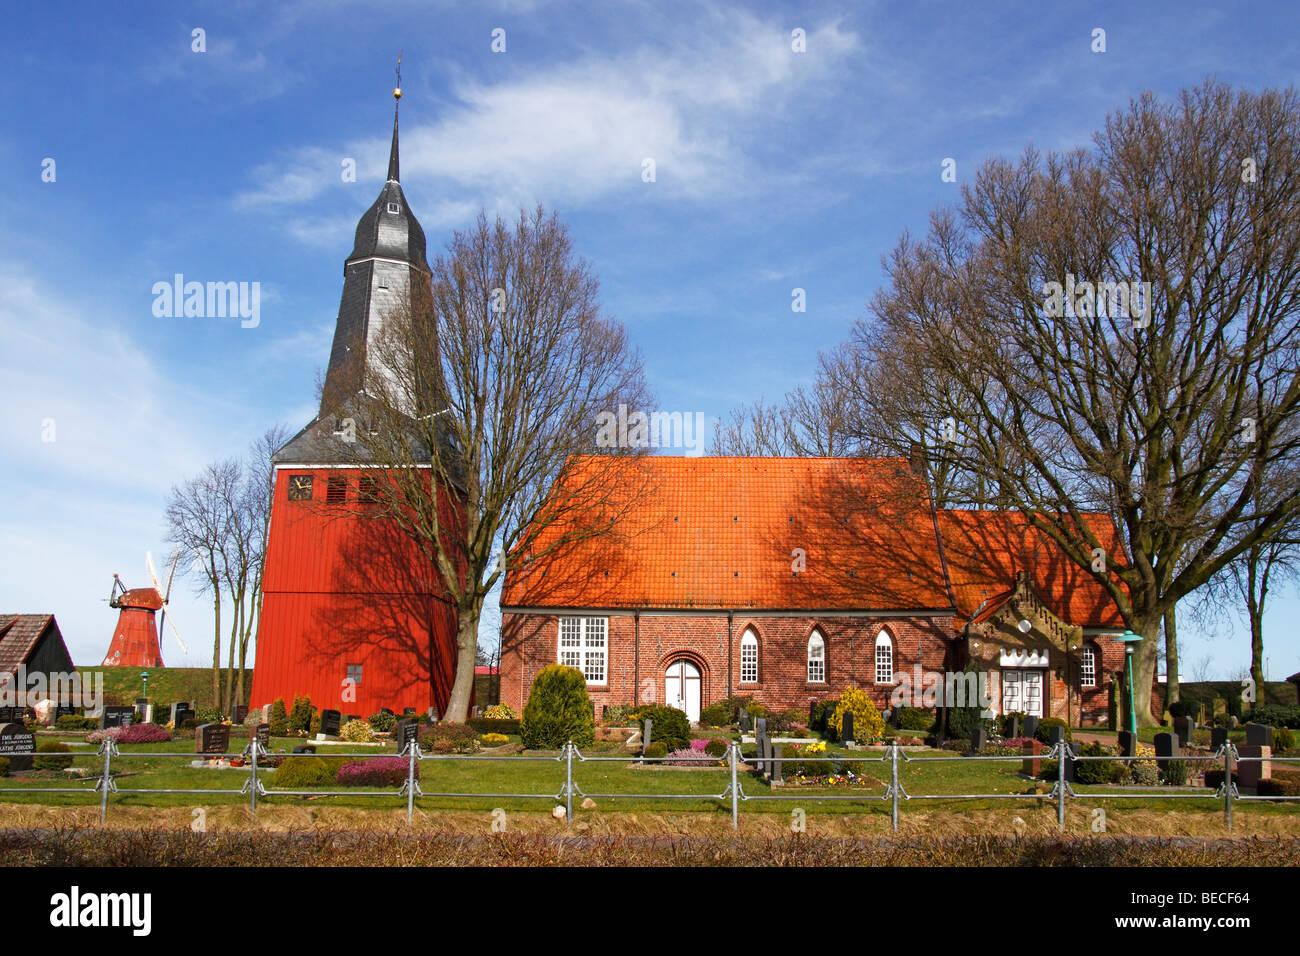 St. Nicolai-Kirche church and old wind mill in Beidenfleth, district Steinburg, Schleswig-Holstein, Germany, - Stock Image